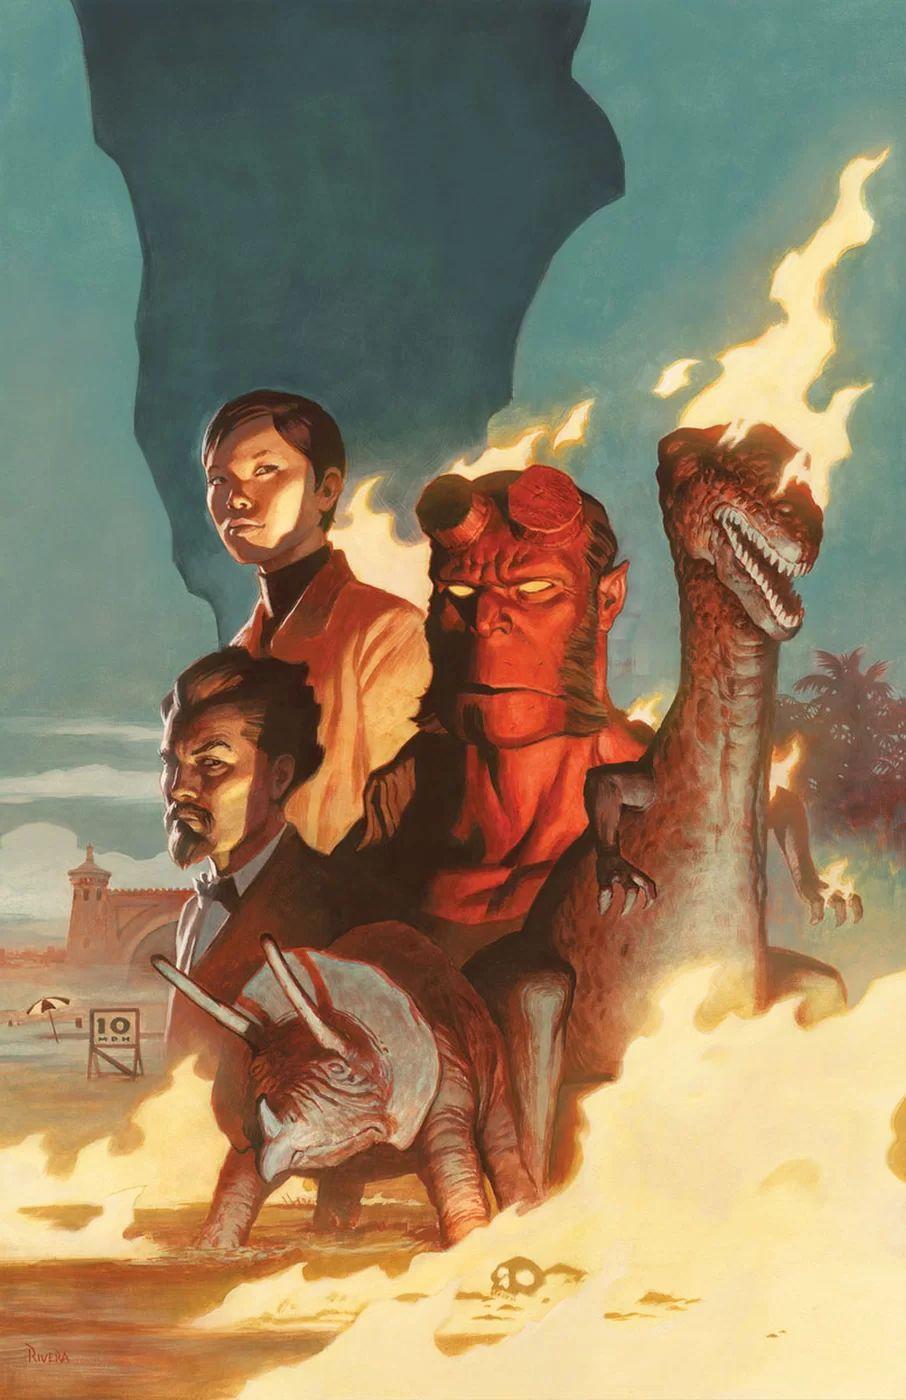 Hellboy and the B.P.R.D.: 1955 – Burning Season